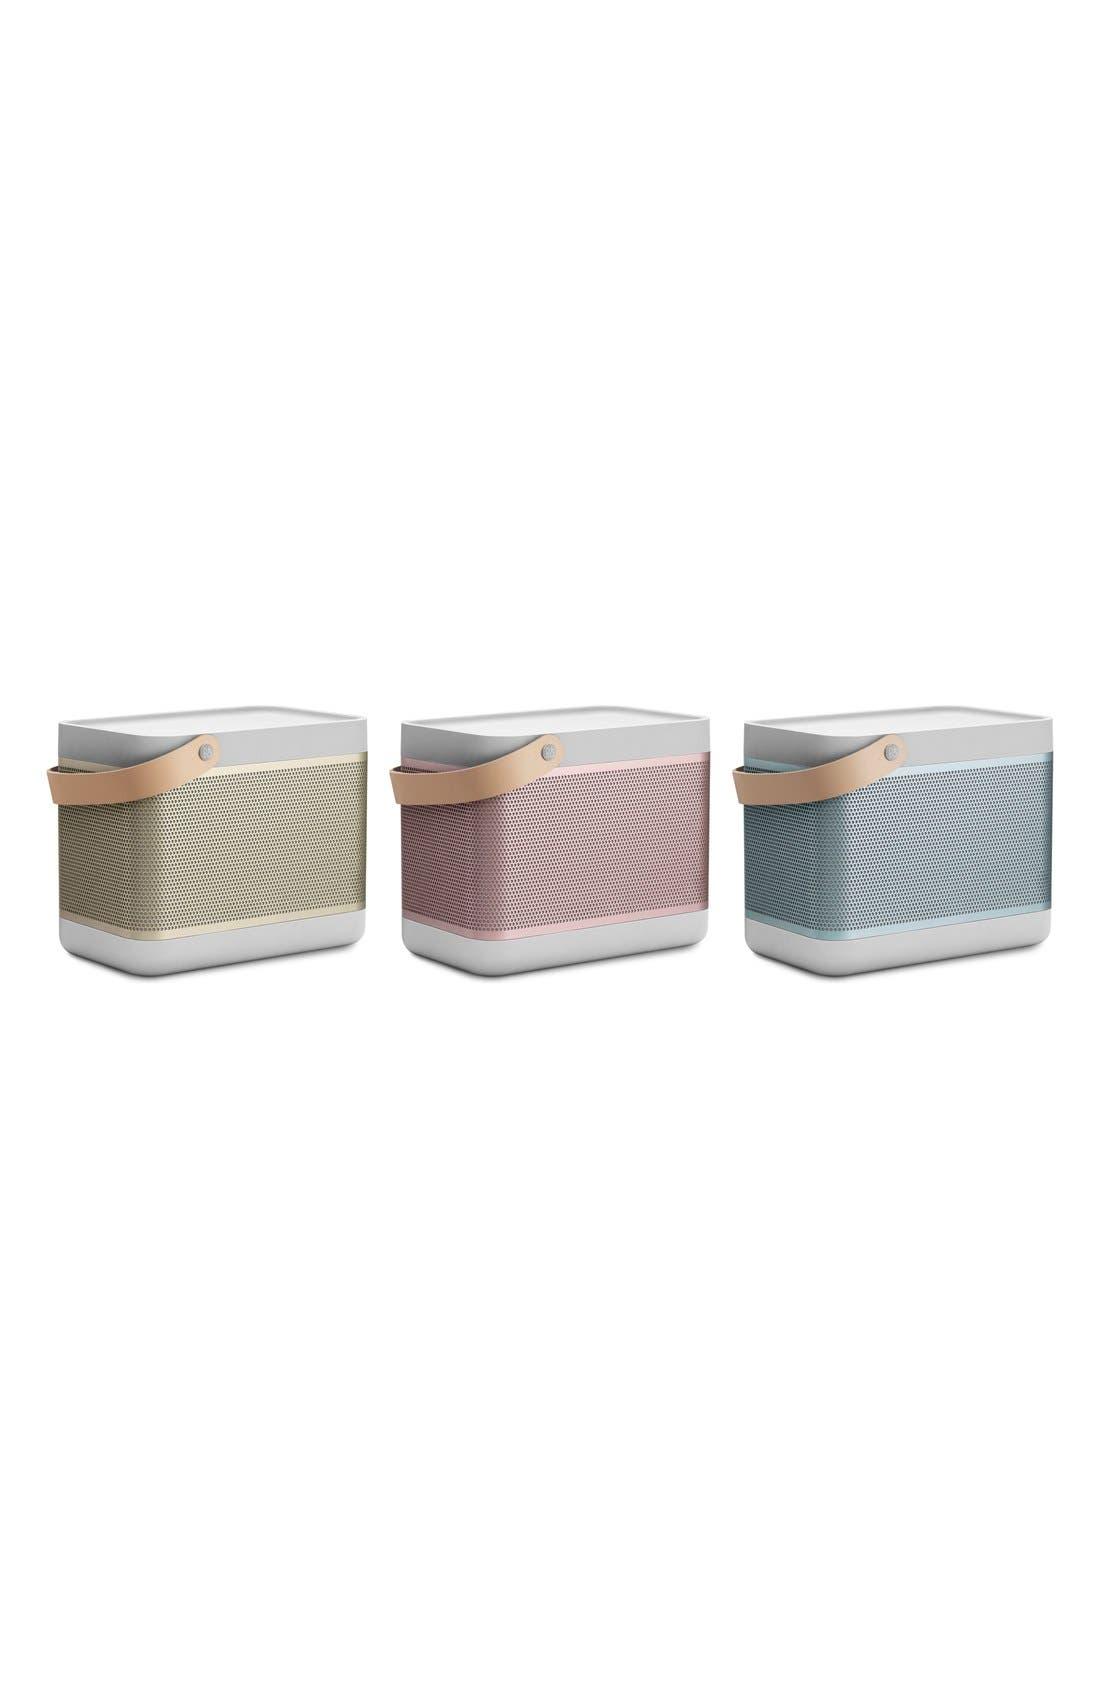 'Beolit 15' Portable Bluetooth<sup>®</sup> Speaker,                             Alternate thumbnail 6, color,                             POLAR BLUE